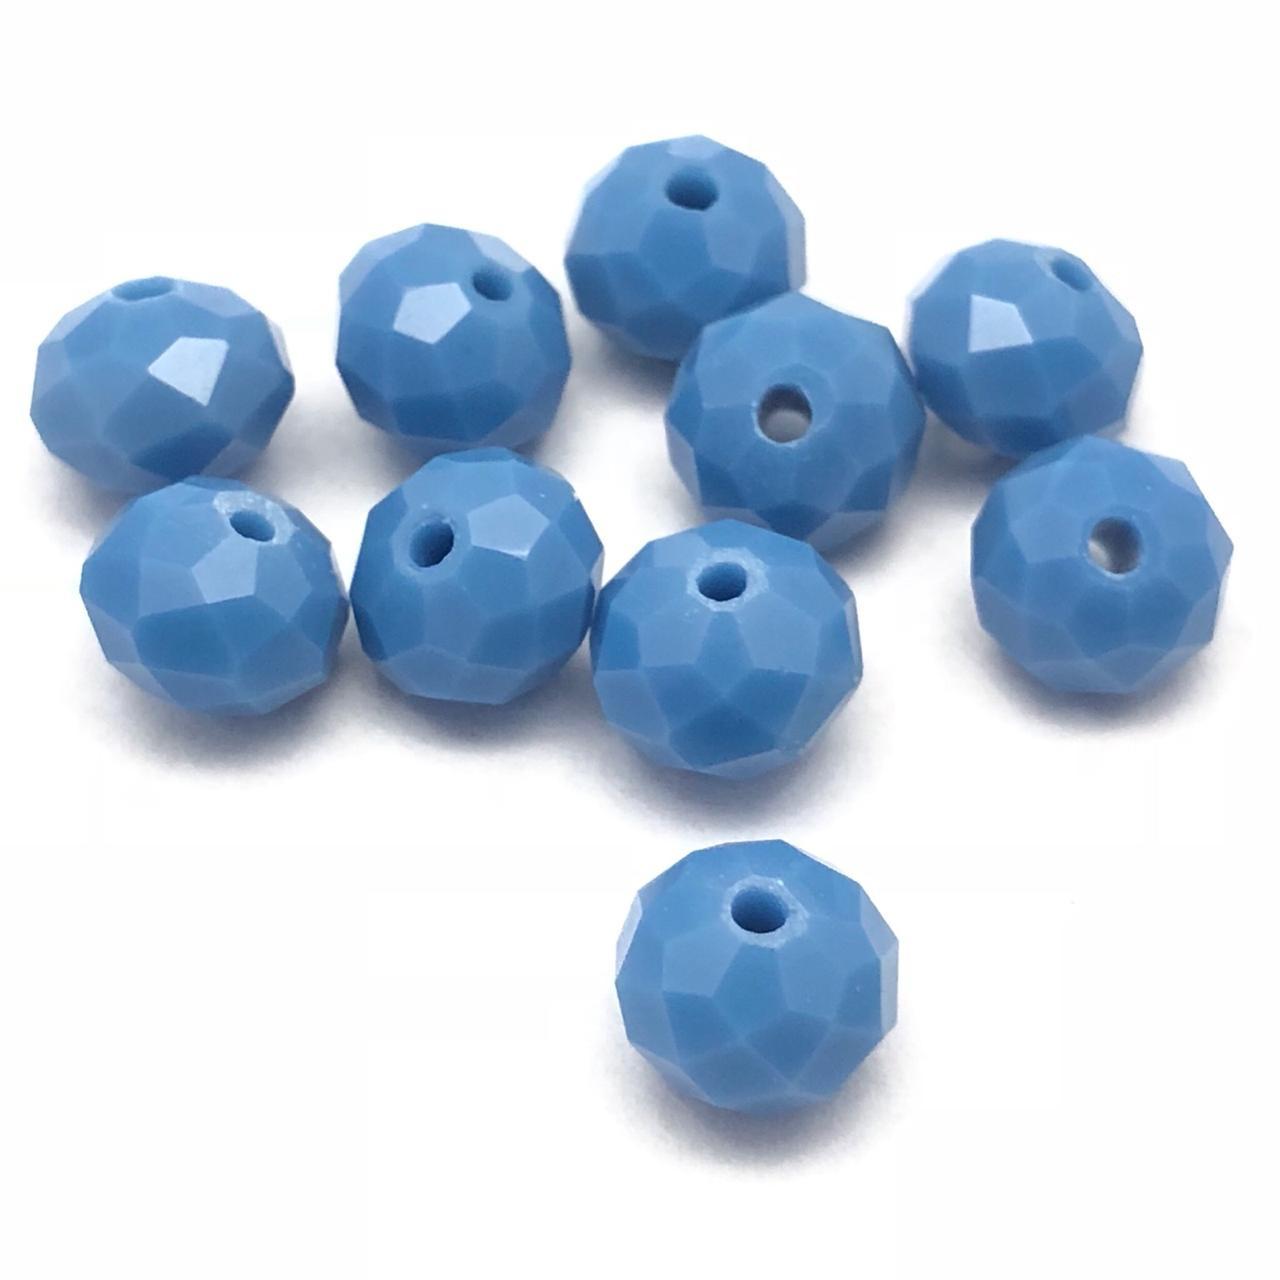 CRT410 - Cristal no Fio Azul Jeans 8mm - 72Unid